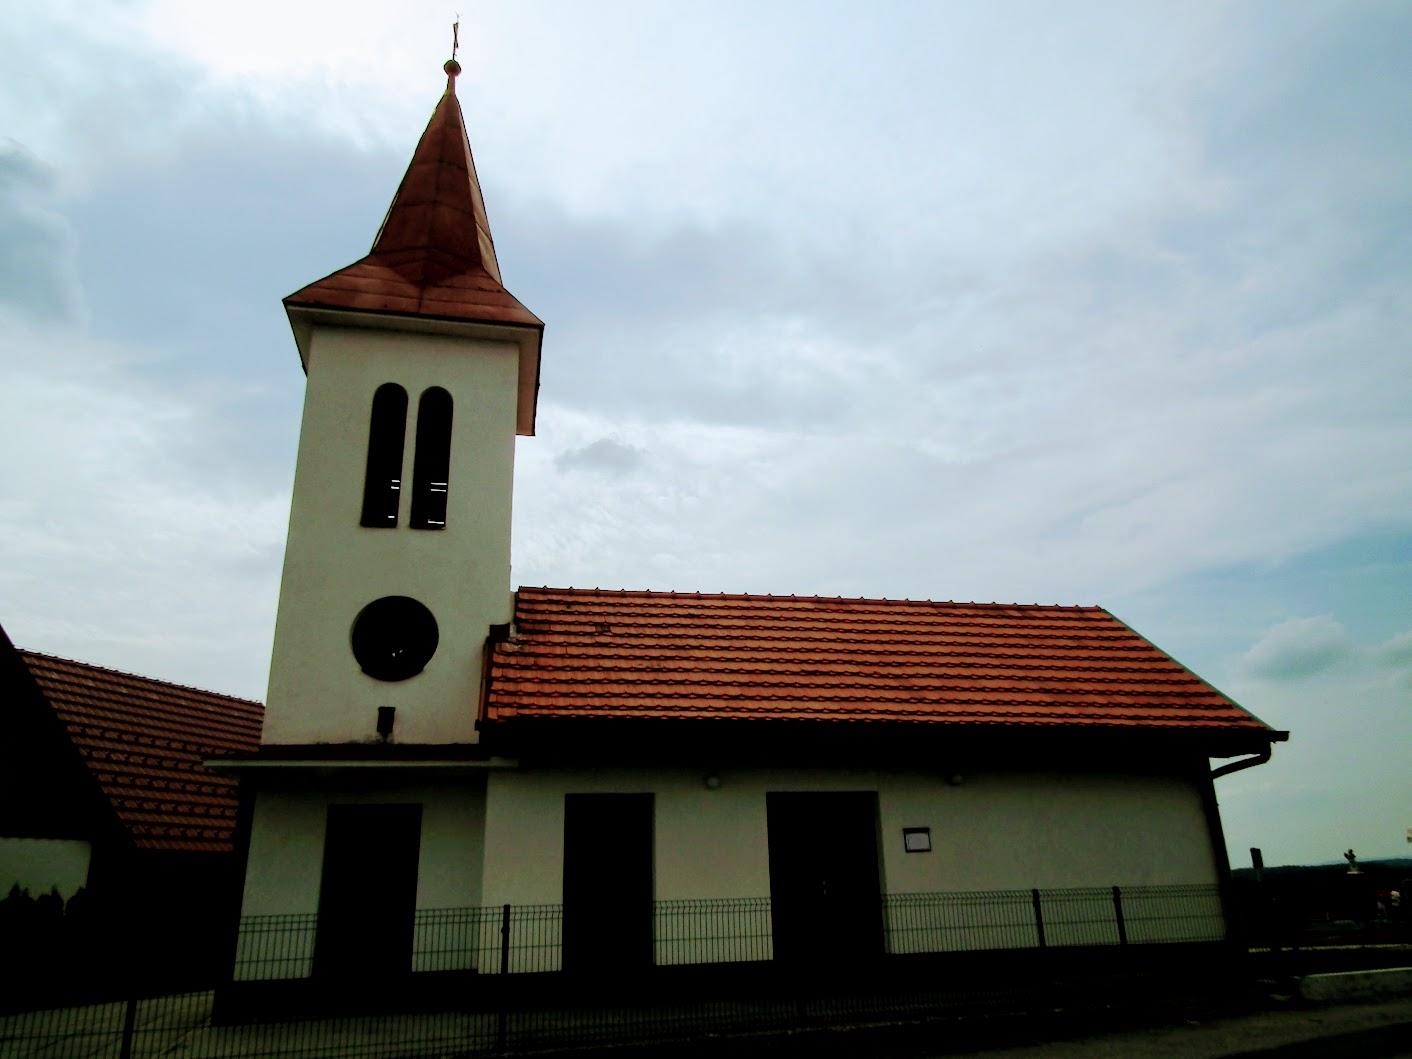 Suhi vrh (Szárazhegy) - kapela na pokopališču (temetőkápolna)